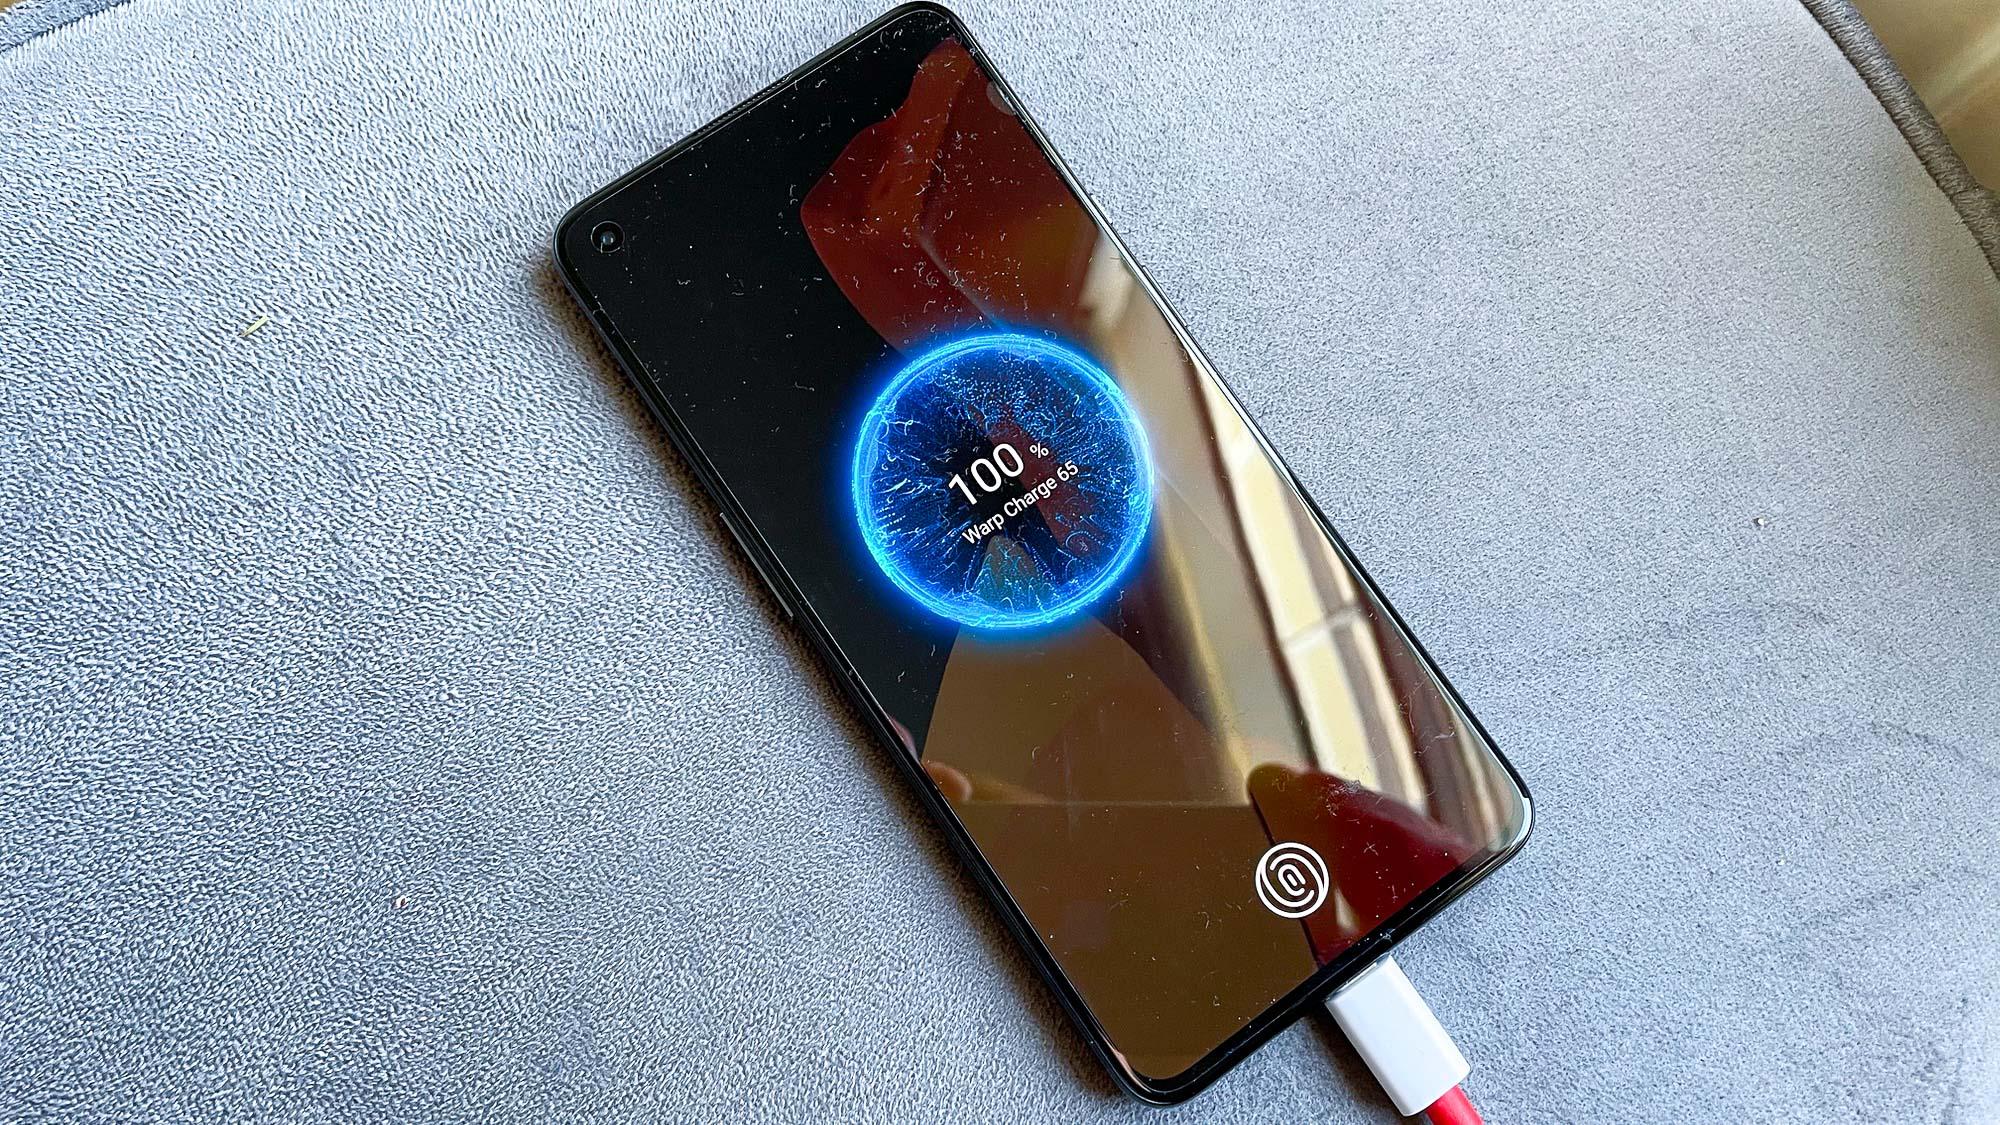 OnePlus 9T: OnePlus 9 charging